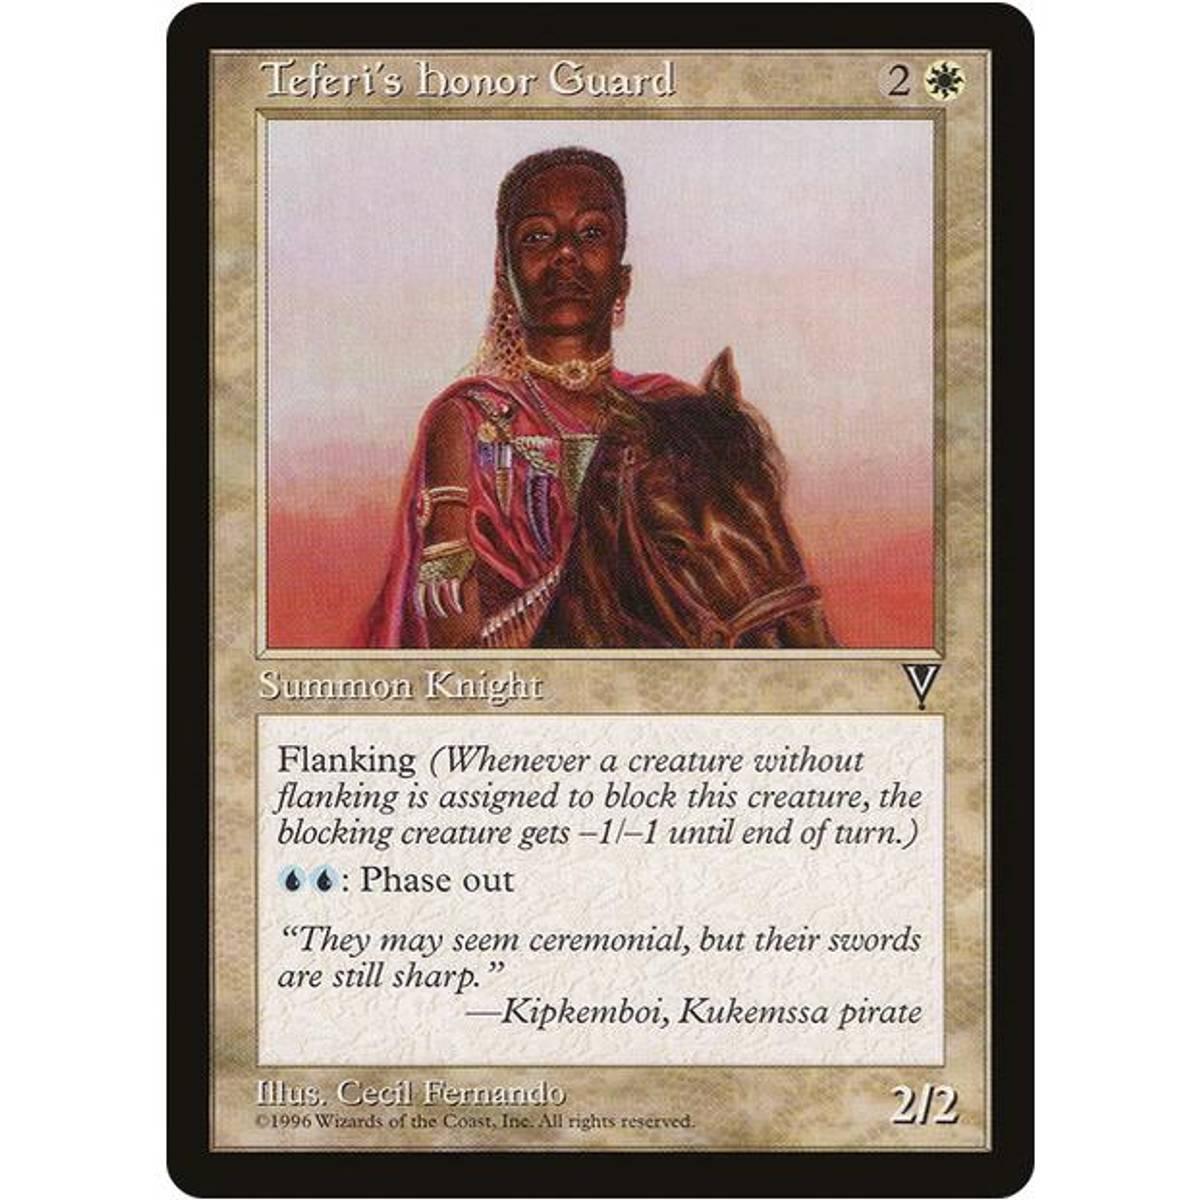 Teferi's Honor Guard